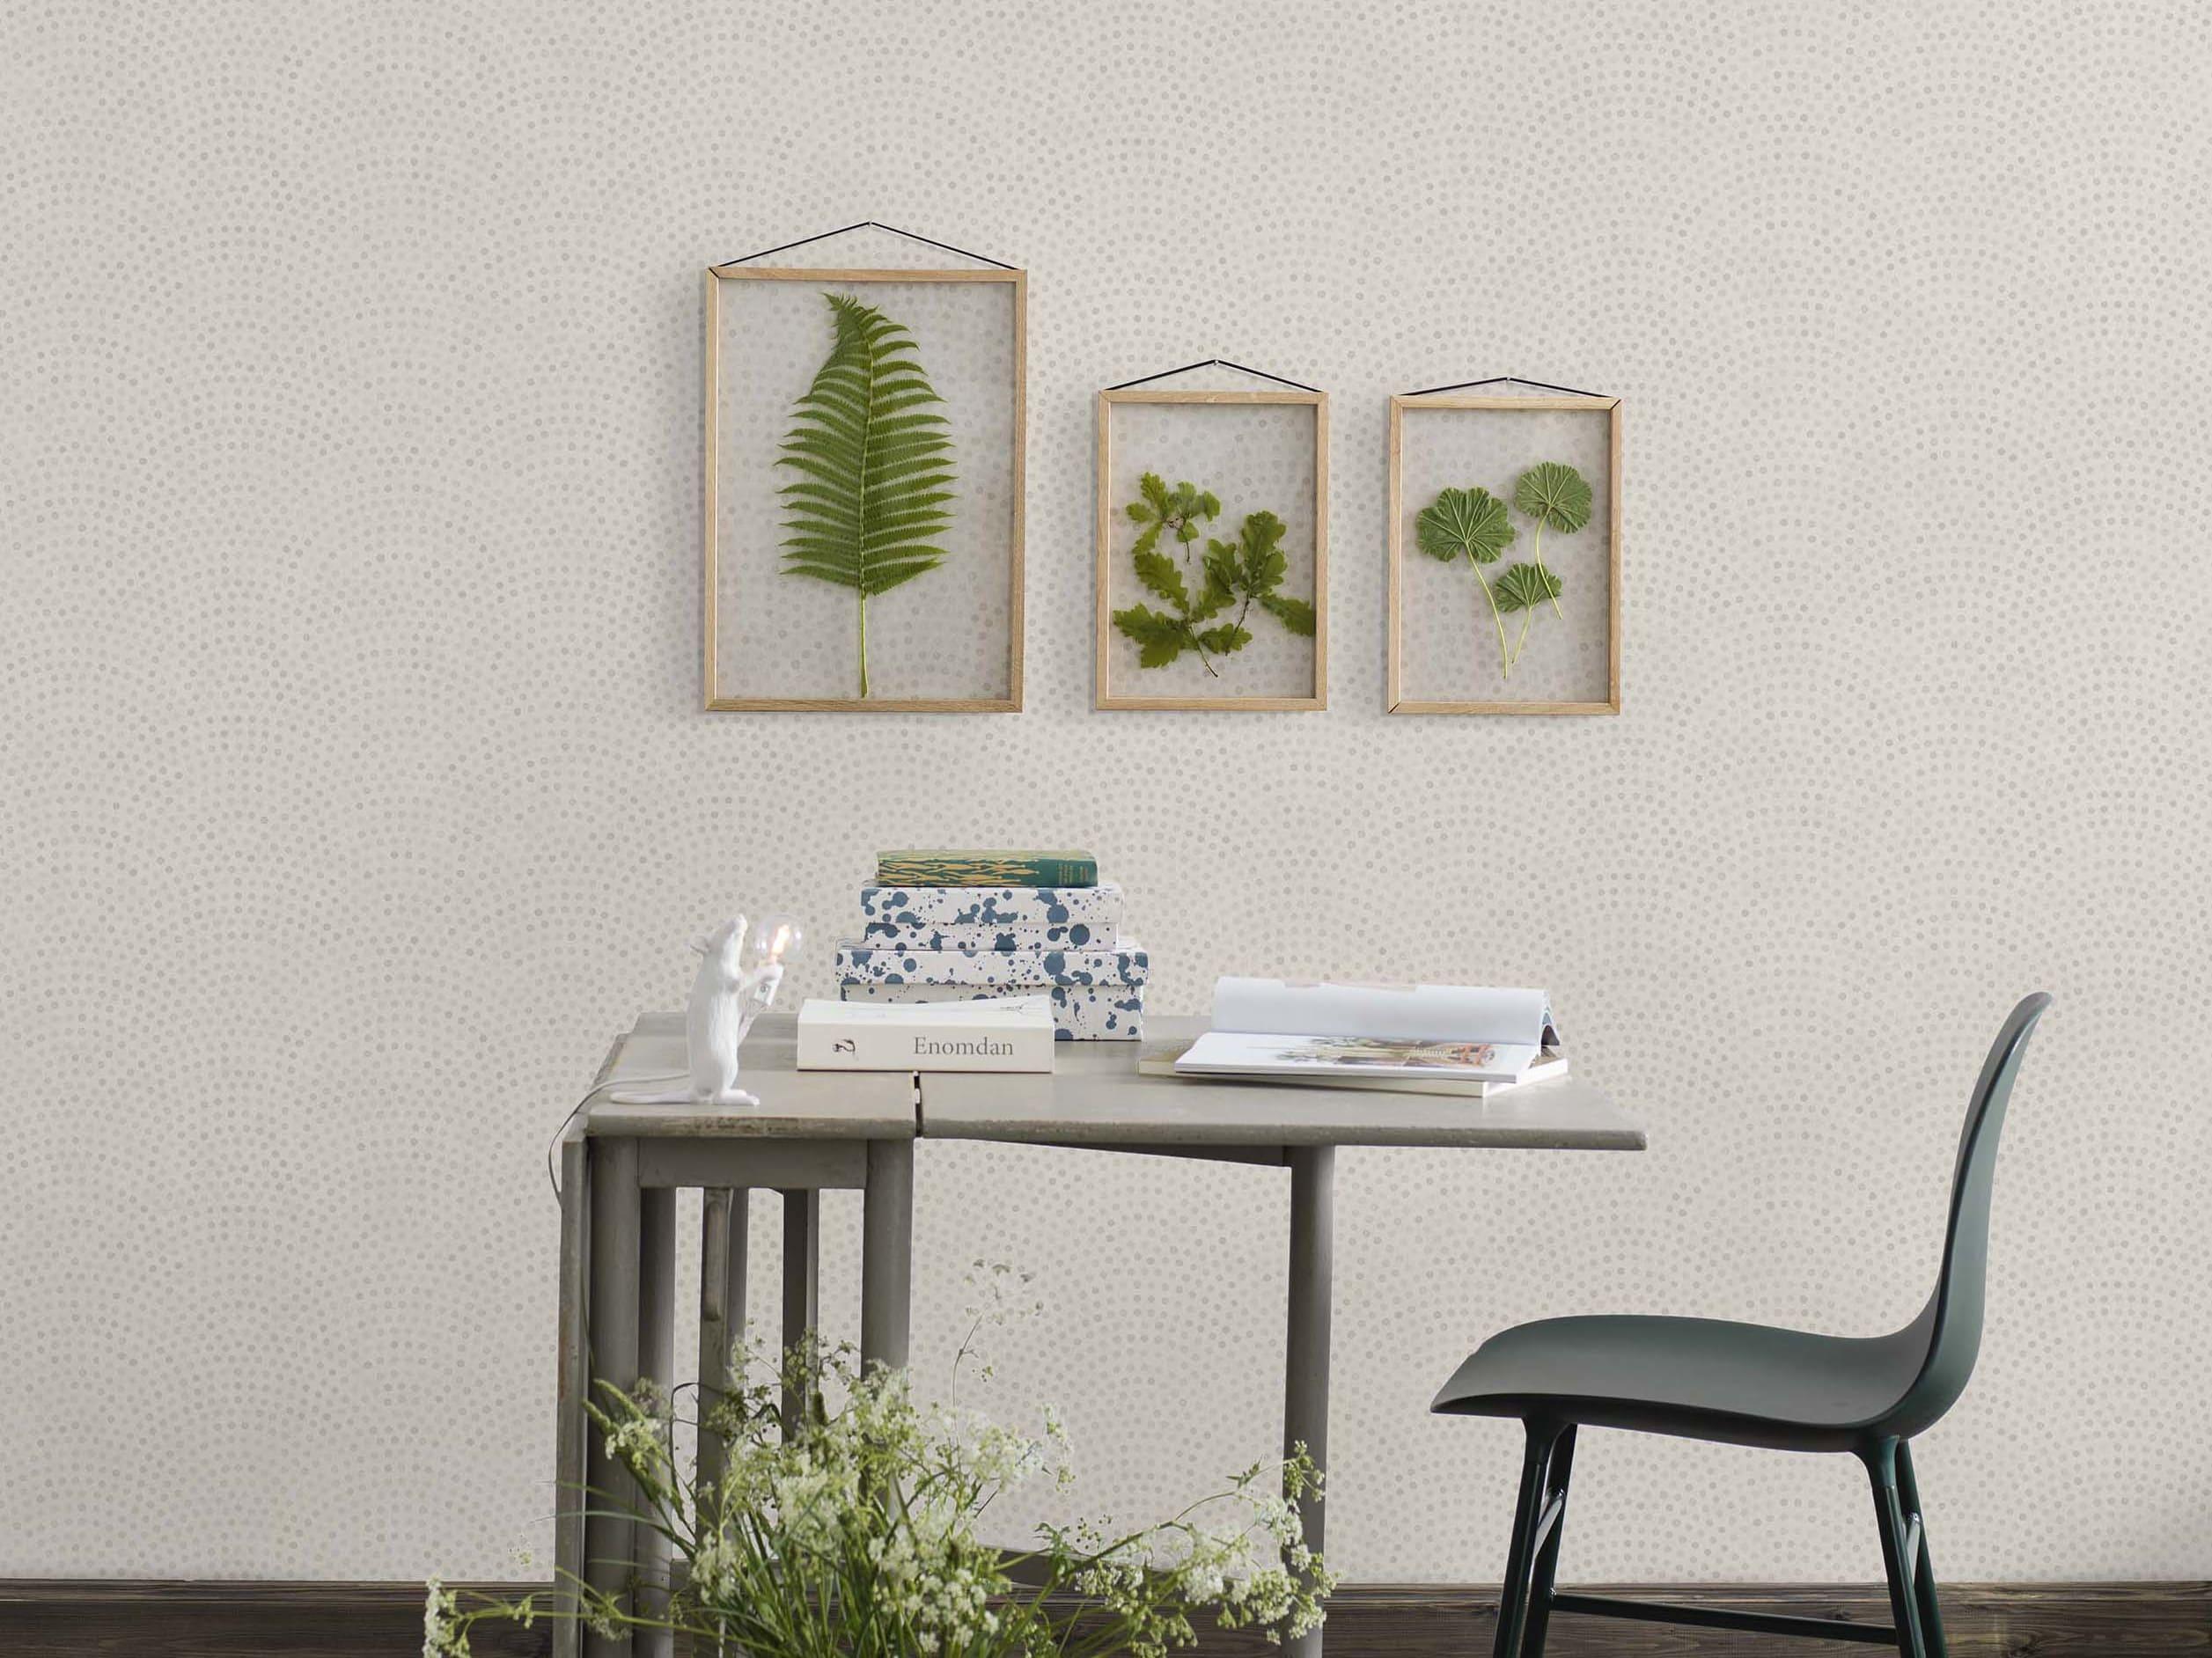 bor stapeter classic contemporary wallpapers for inspiring d cors mynewsdesk. Black Bedroom Furniture Sets. Home Design Ideas